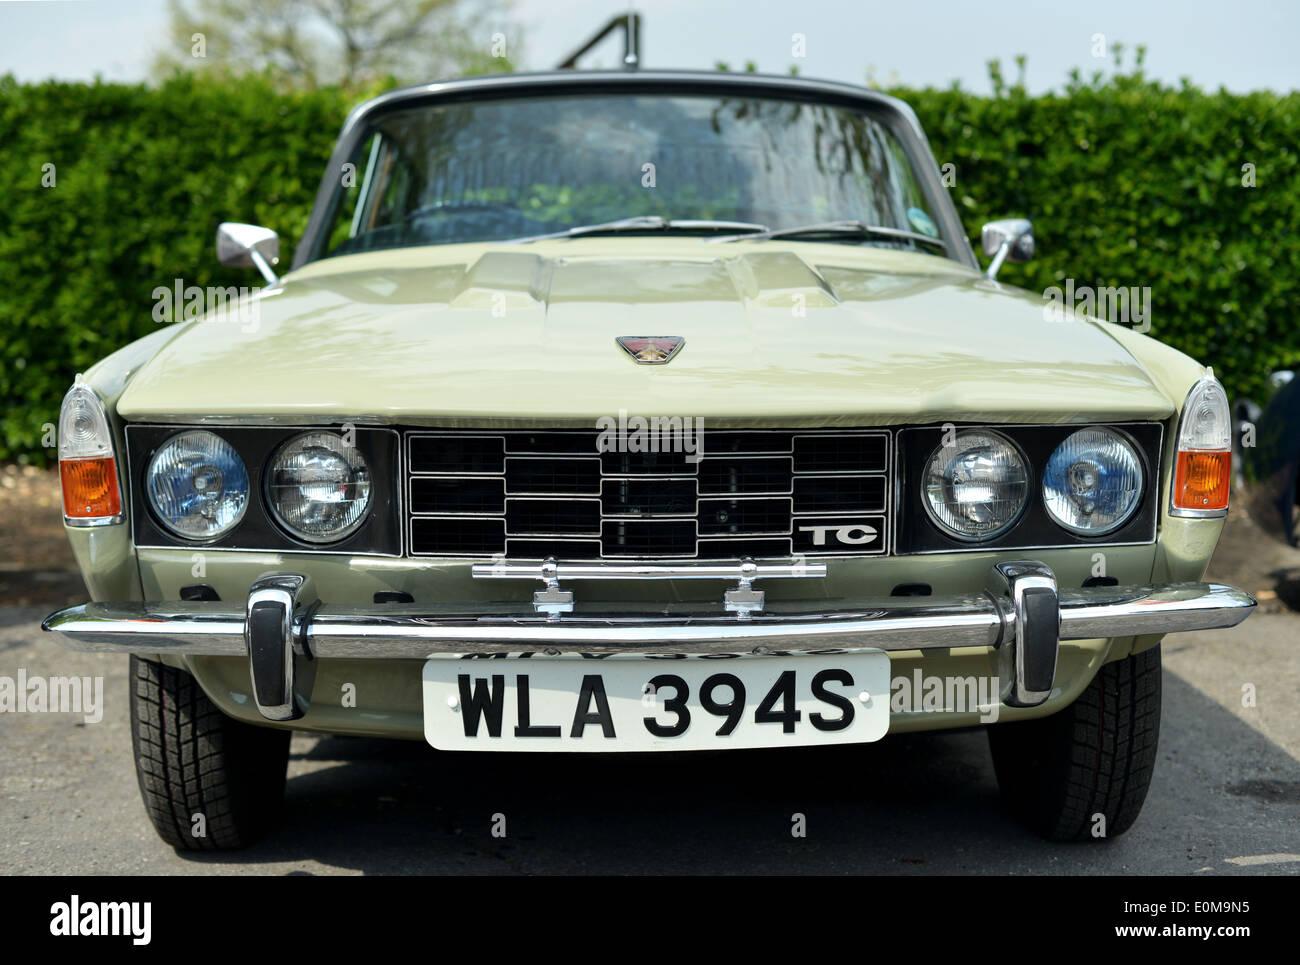 Nada Classic Cars >> Rover P6 2200 TC British car at Chatham Dockyard classic car show Stock Photo: 69288161 - Alamy